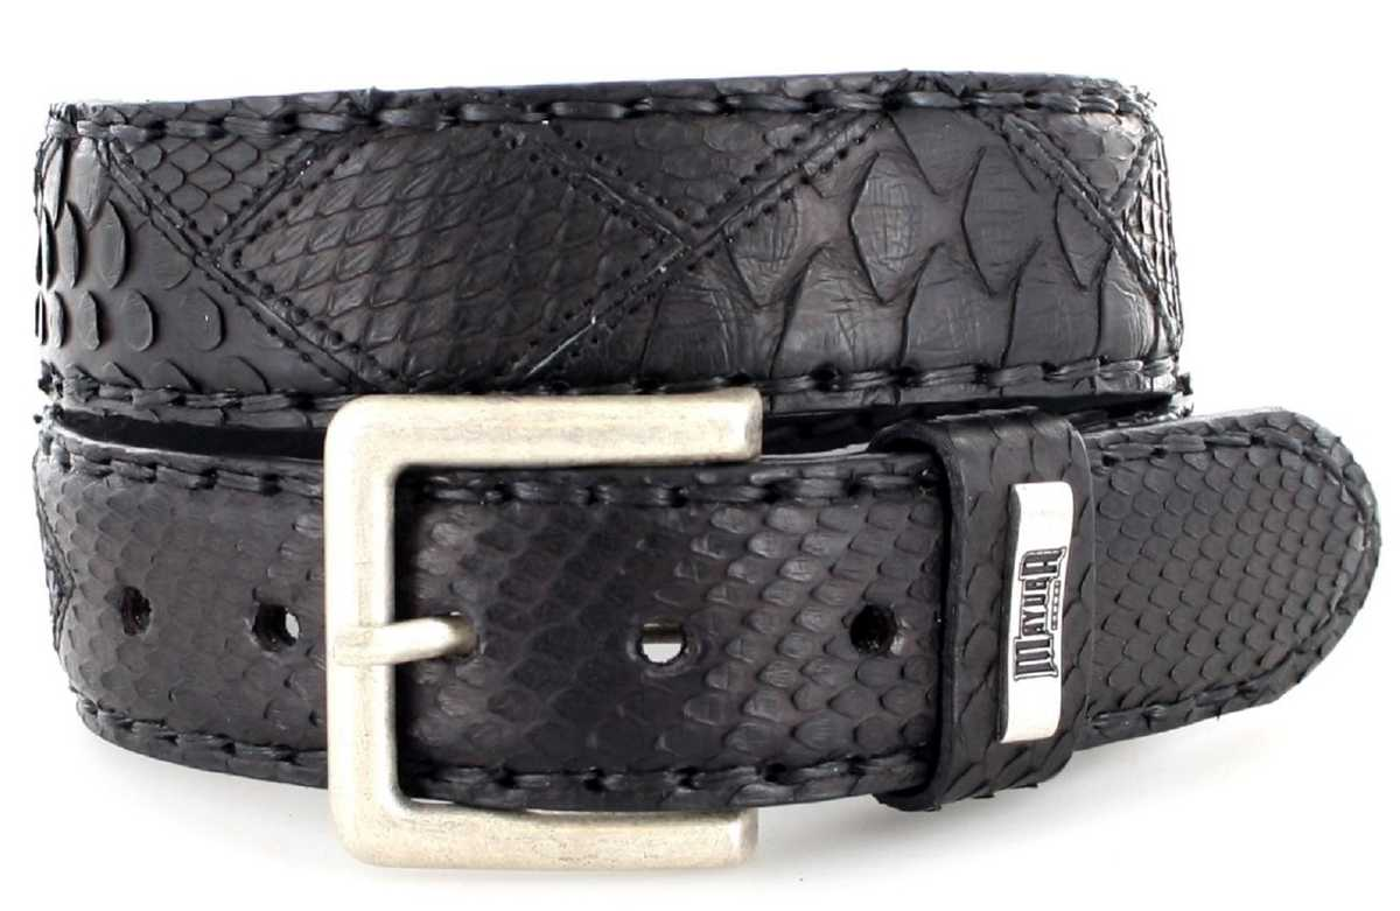 Mayura Boots MB1020 Negro Exotic  leather belt - black